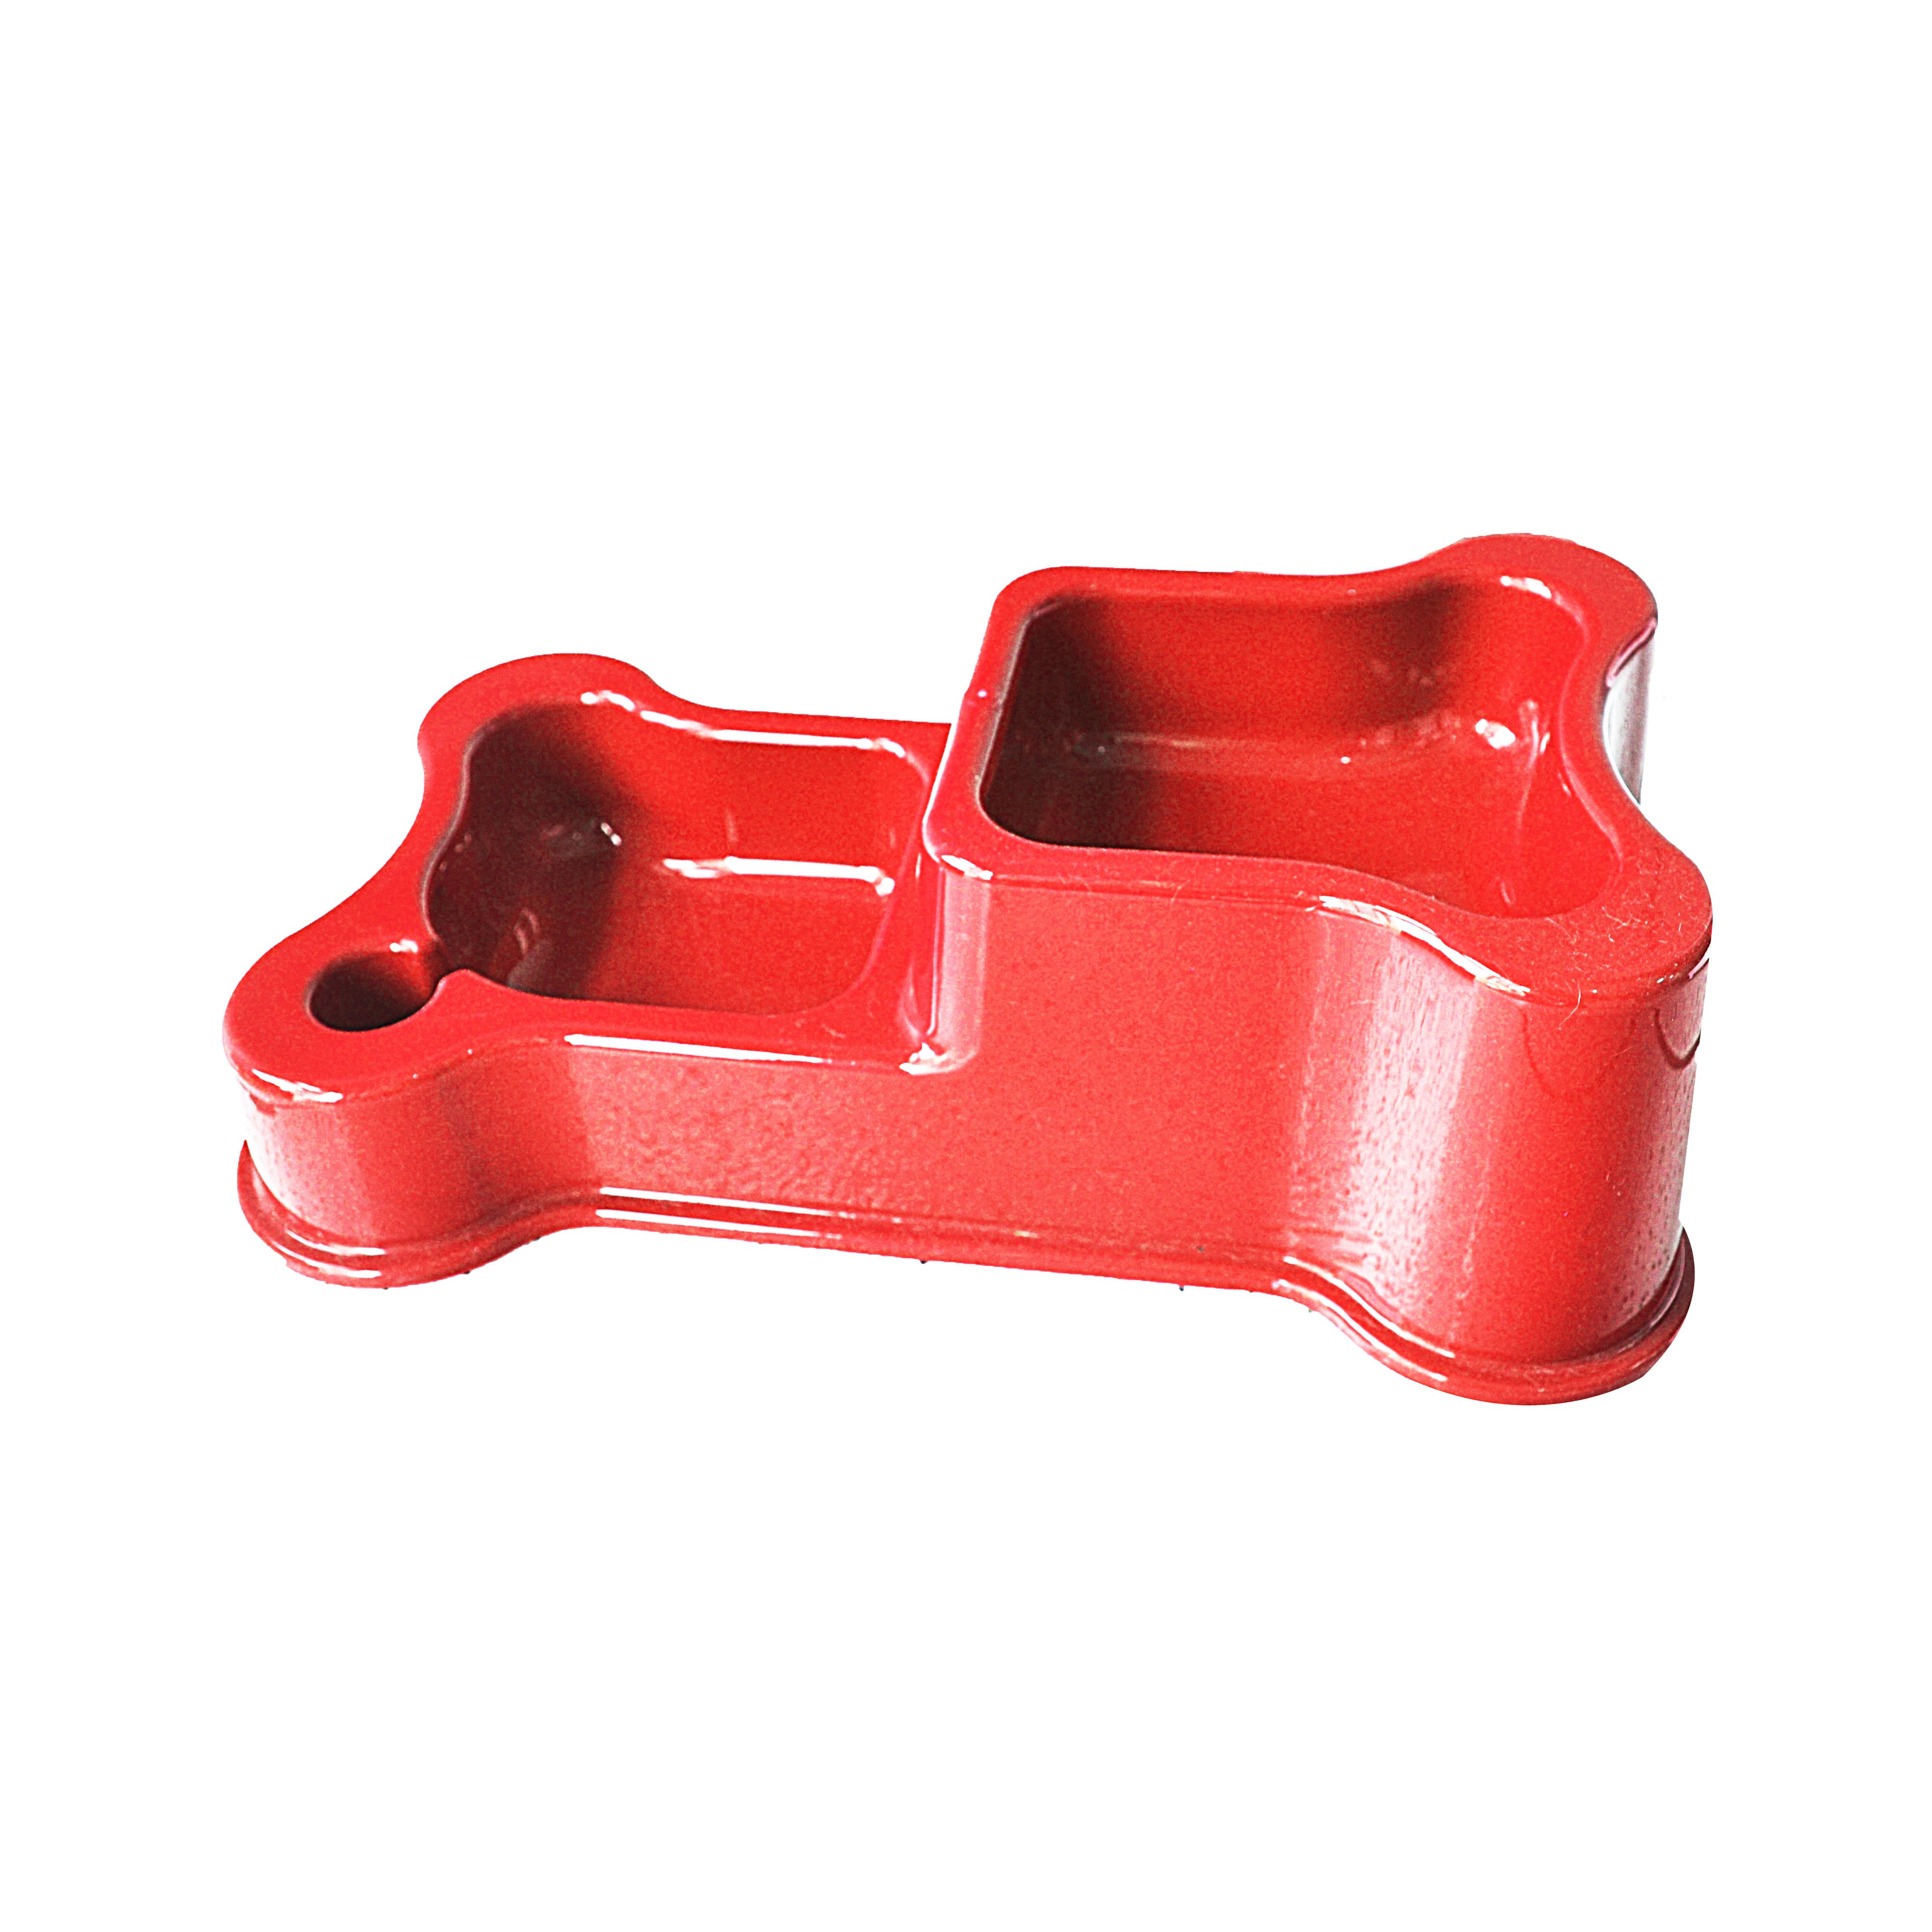 Comedouro e bebedouro duplo style red anti-formiga